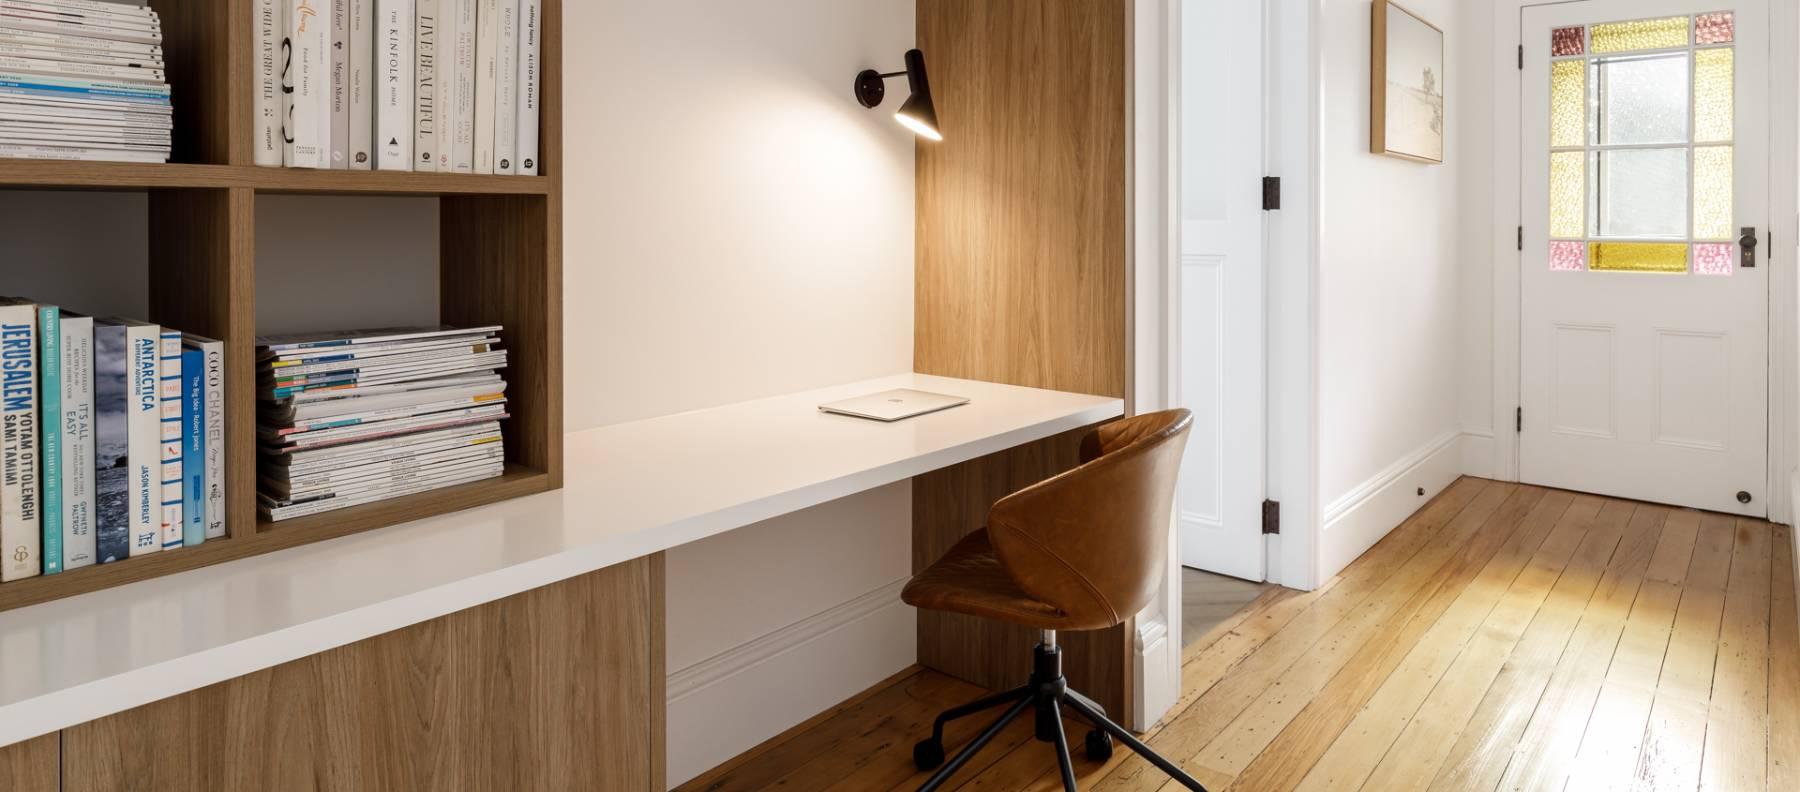 custom study nook